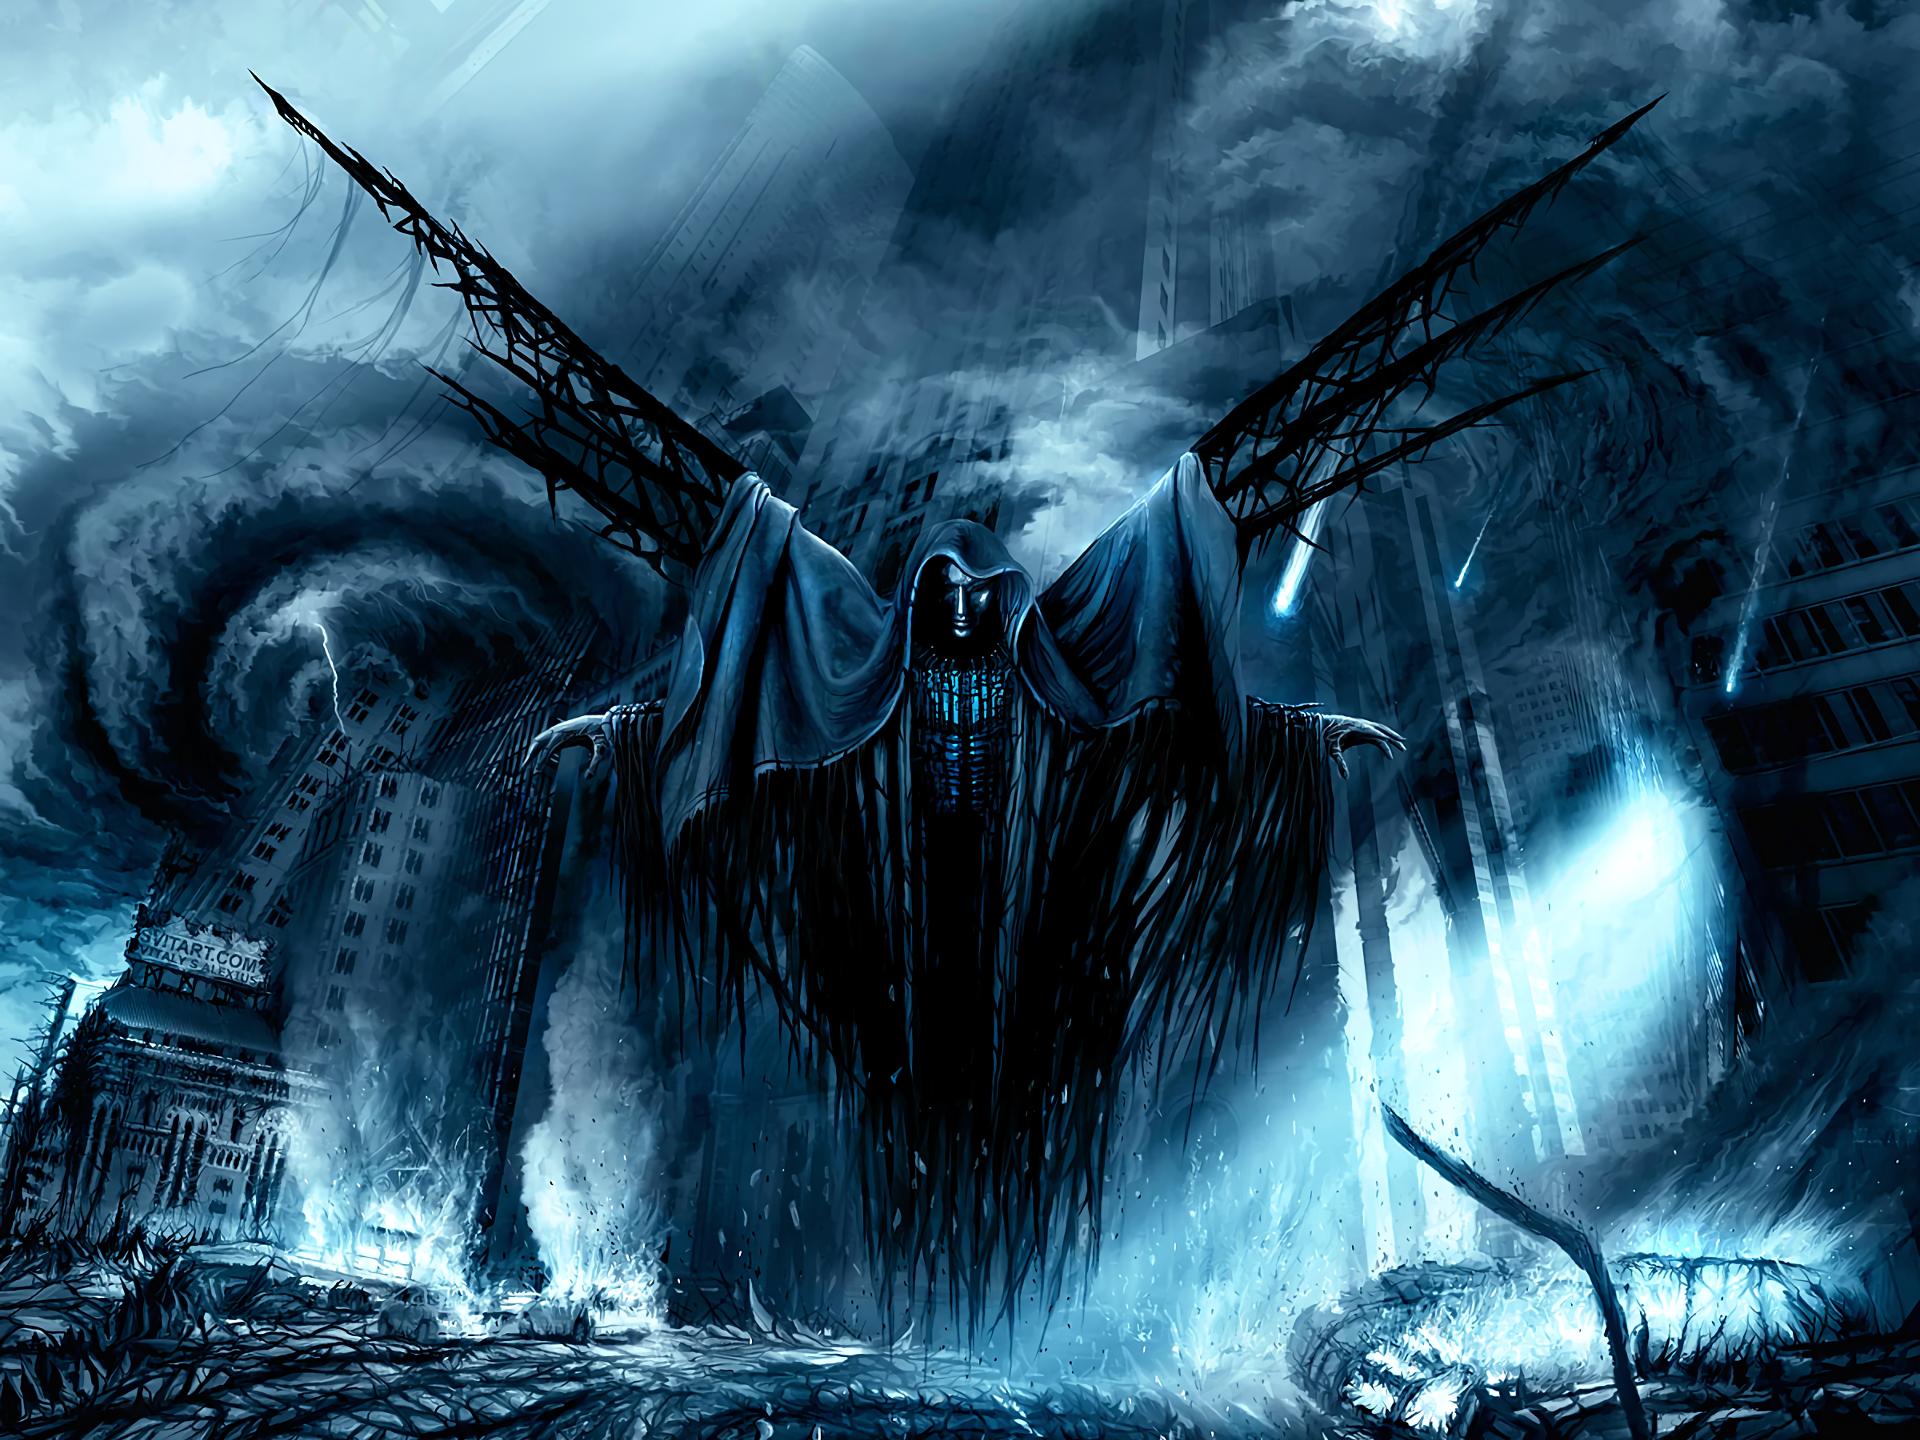 city of fallen angels epub free download